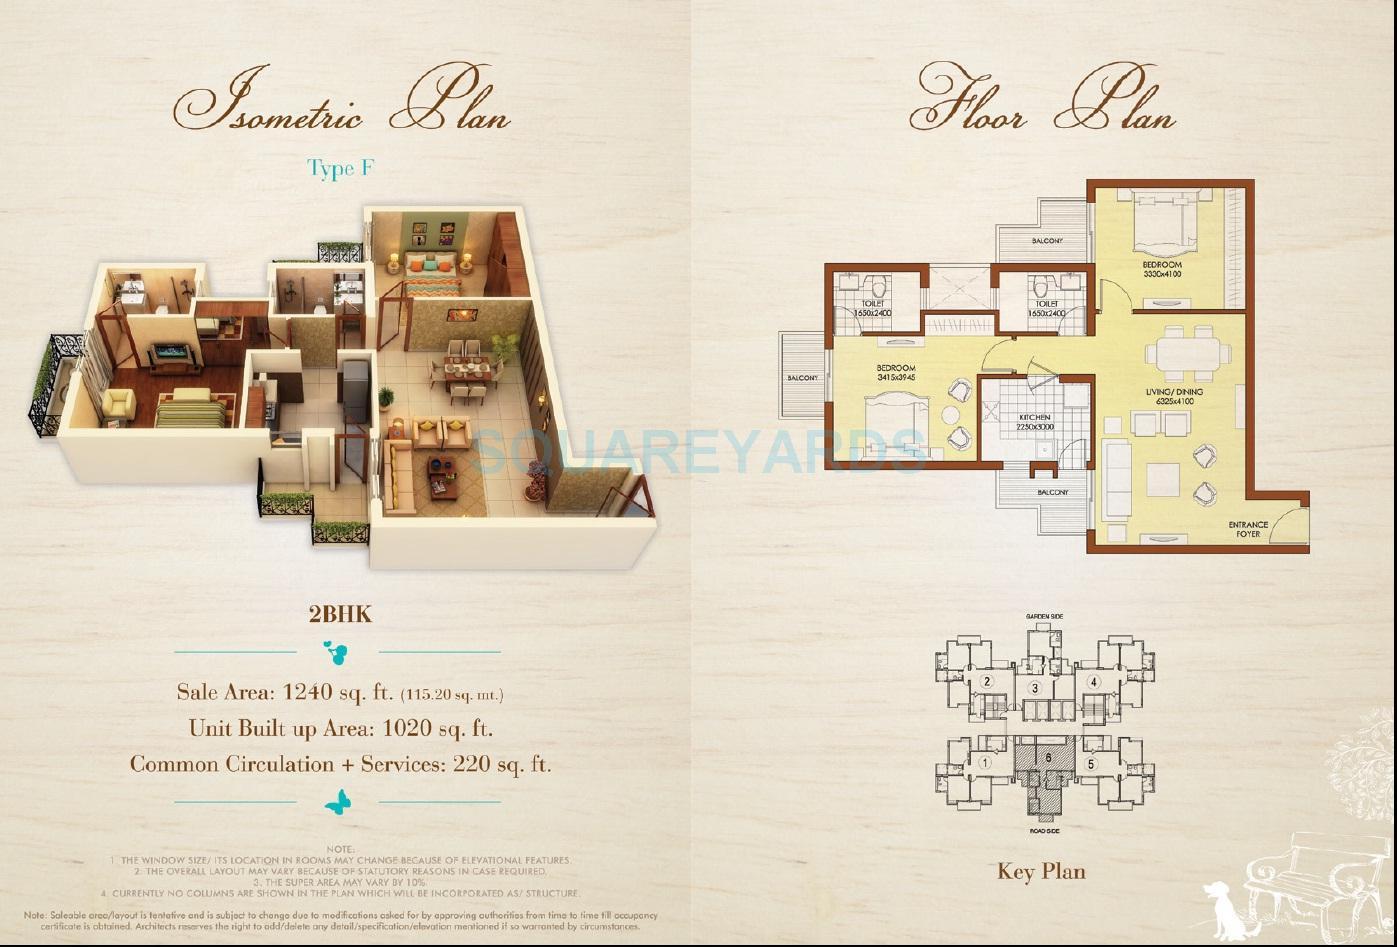 Ats Dolce Zeta I Noida Price List Floor Plan